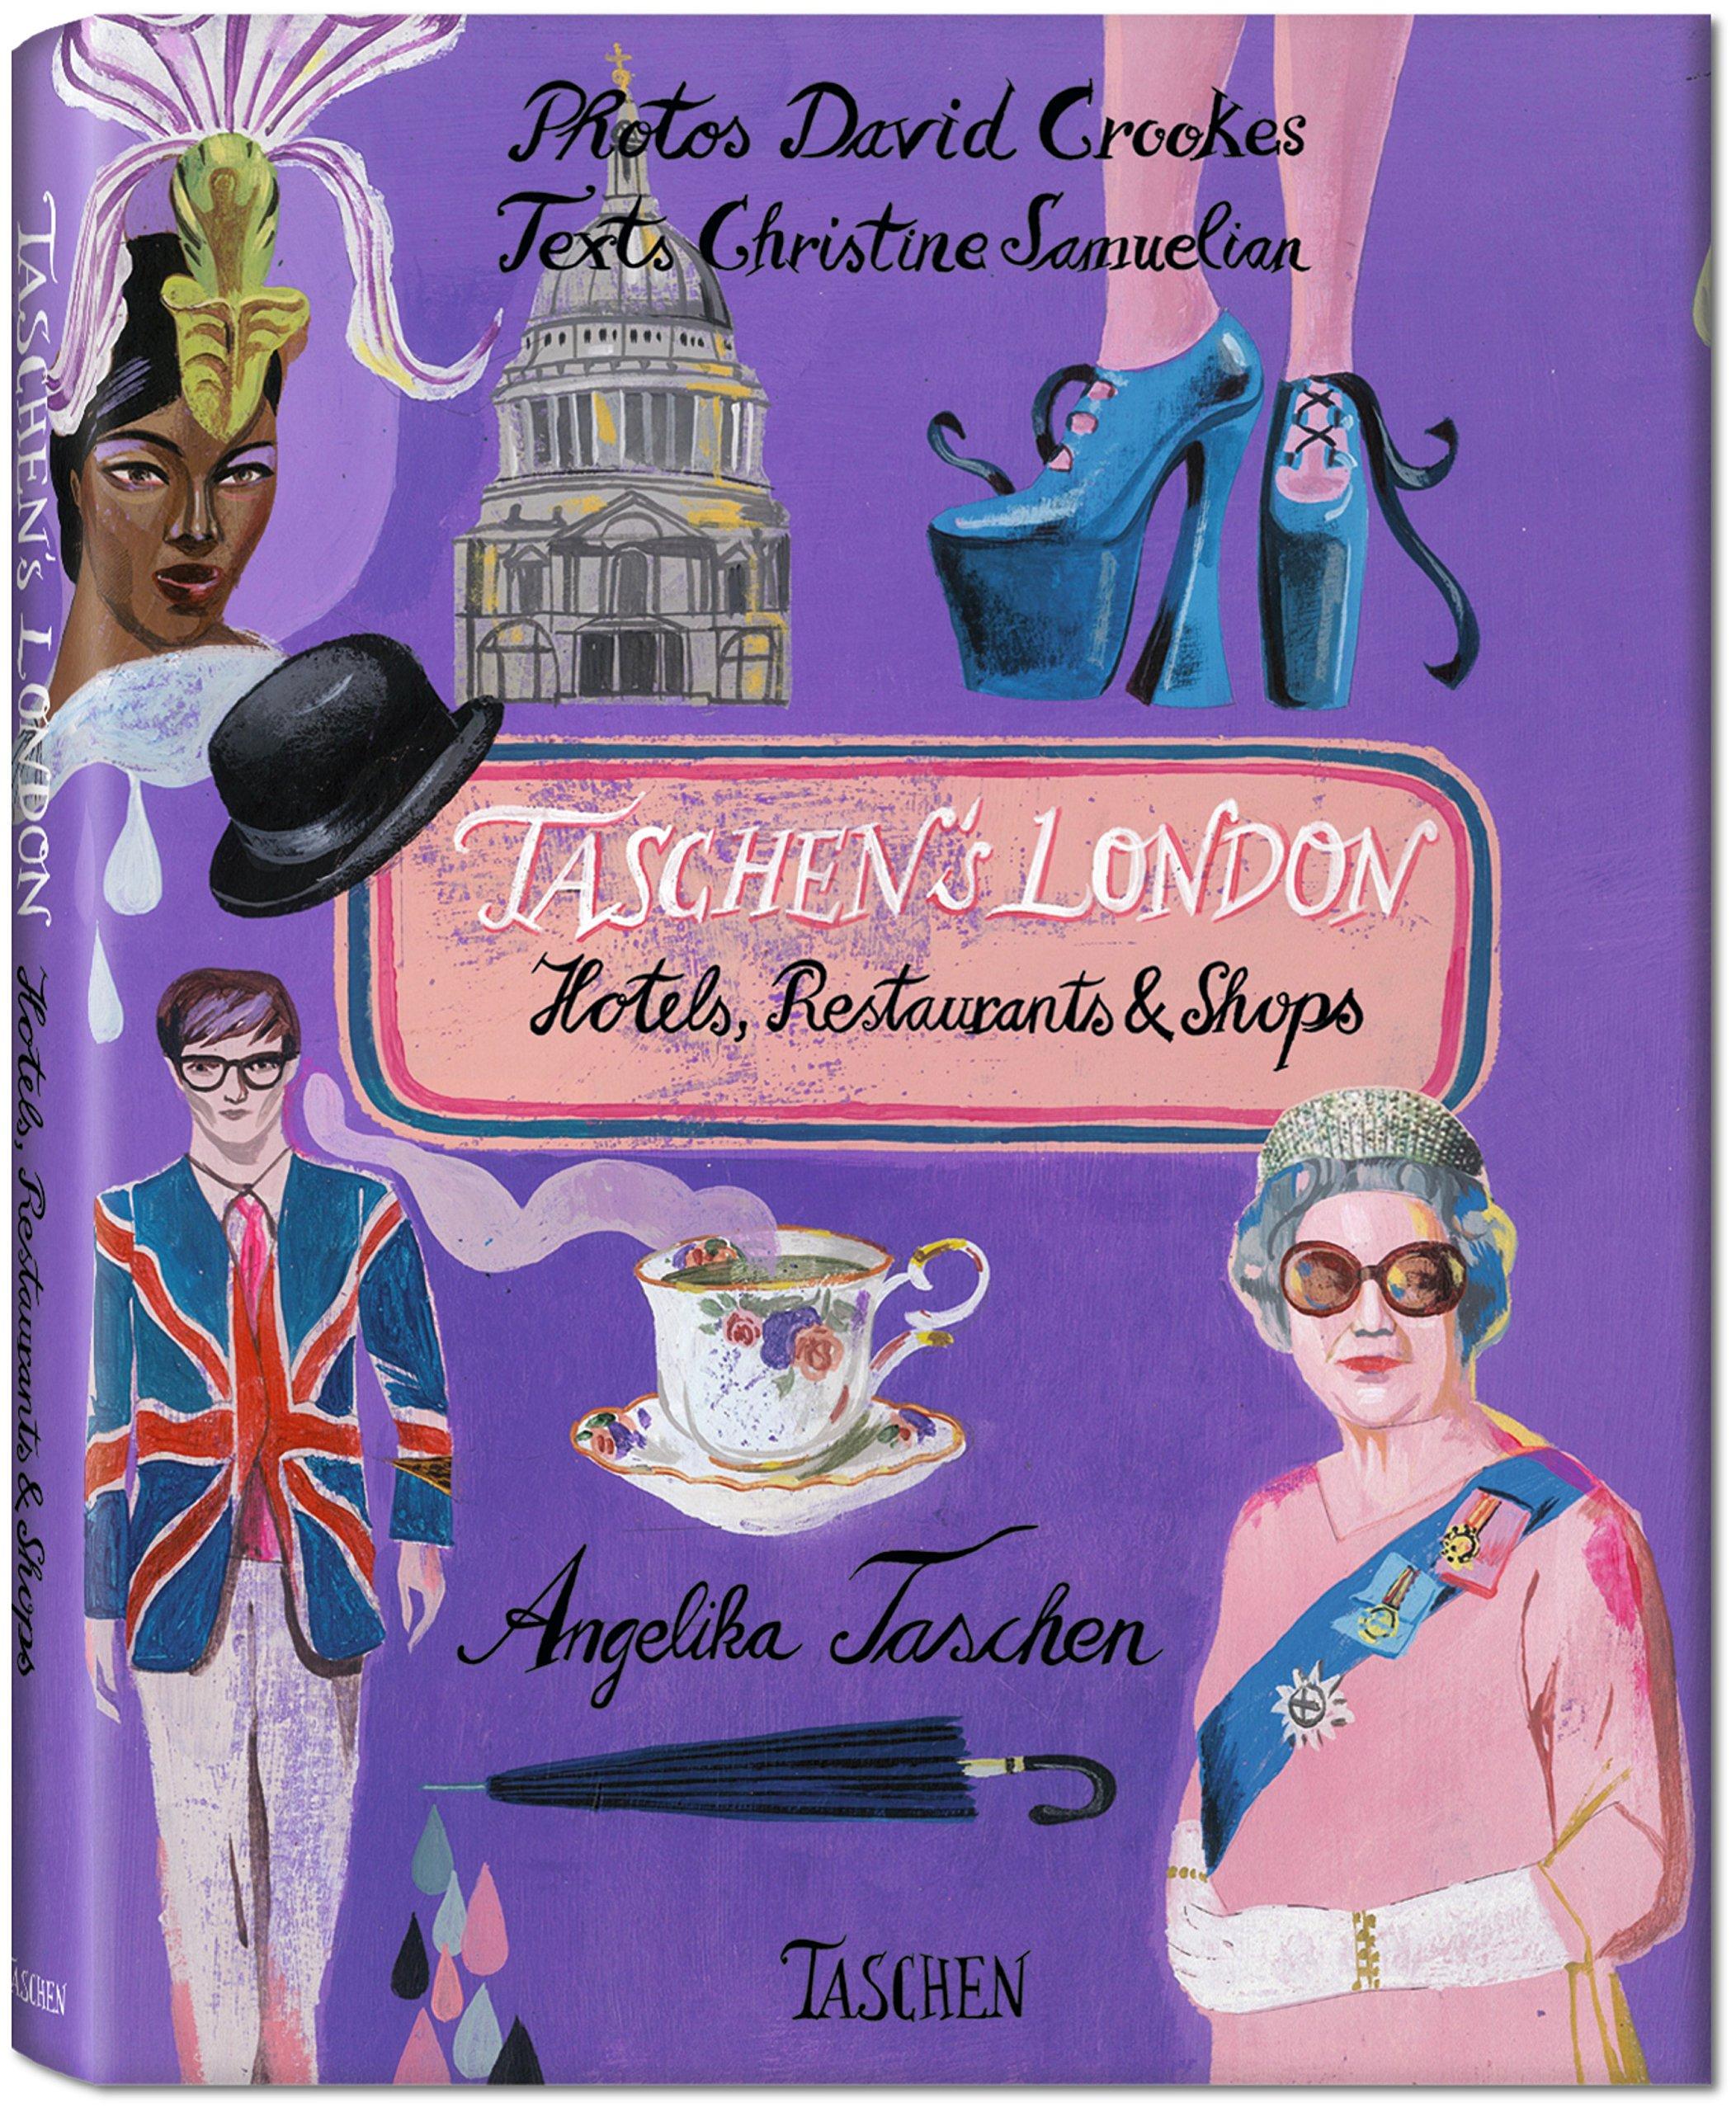 Taschen's London: Hotels, Restaurants and Shops